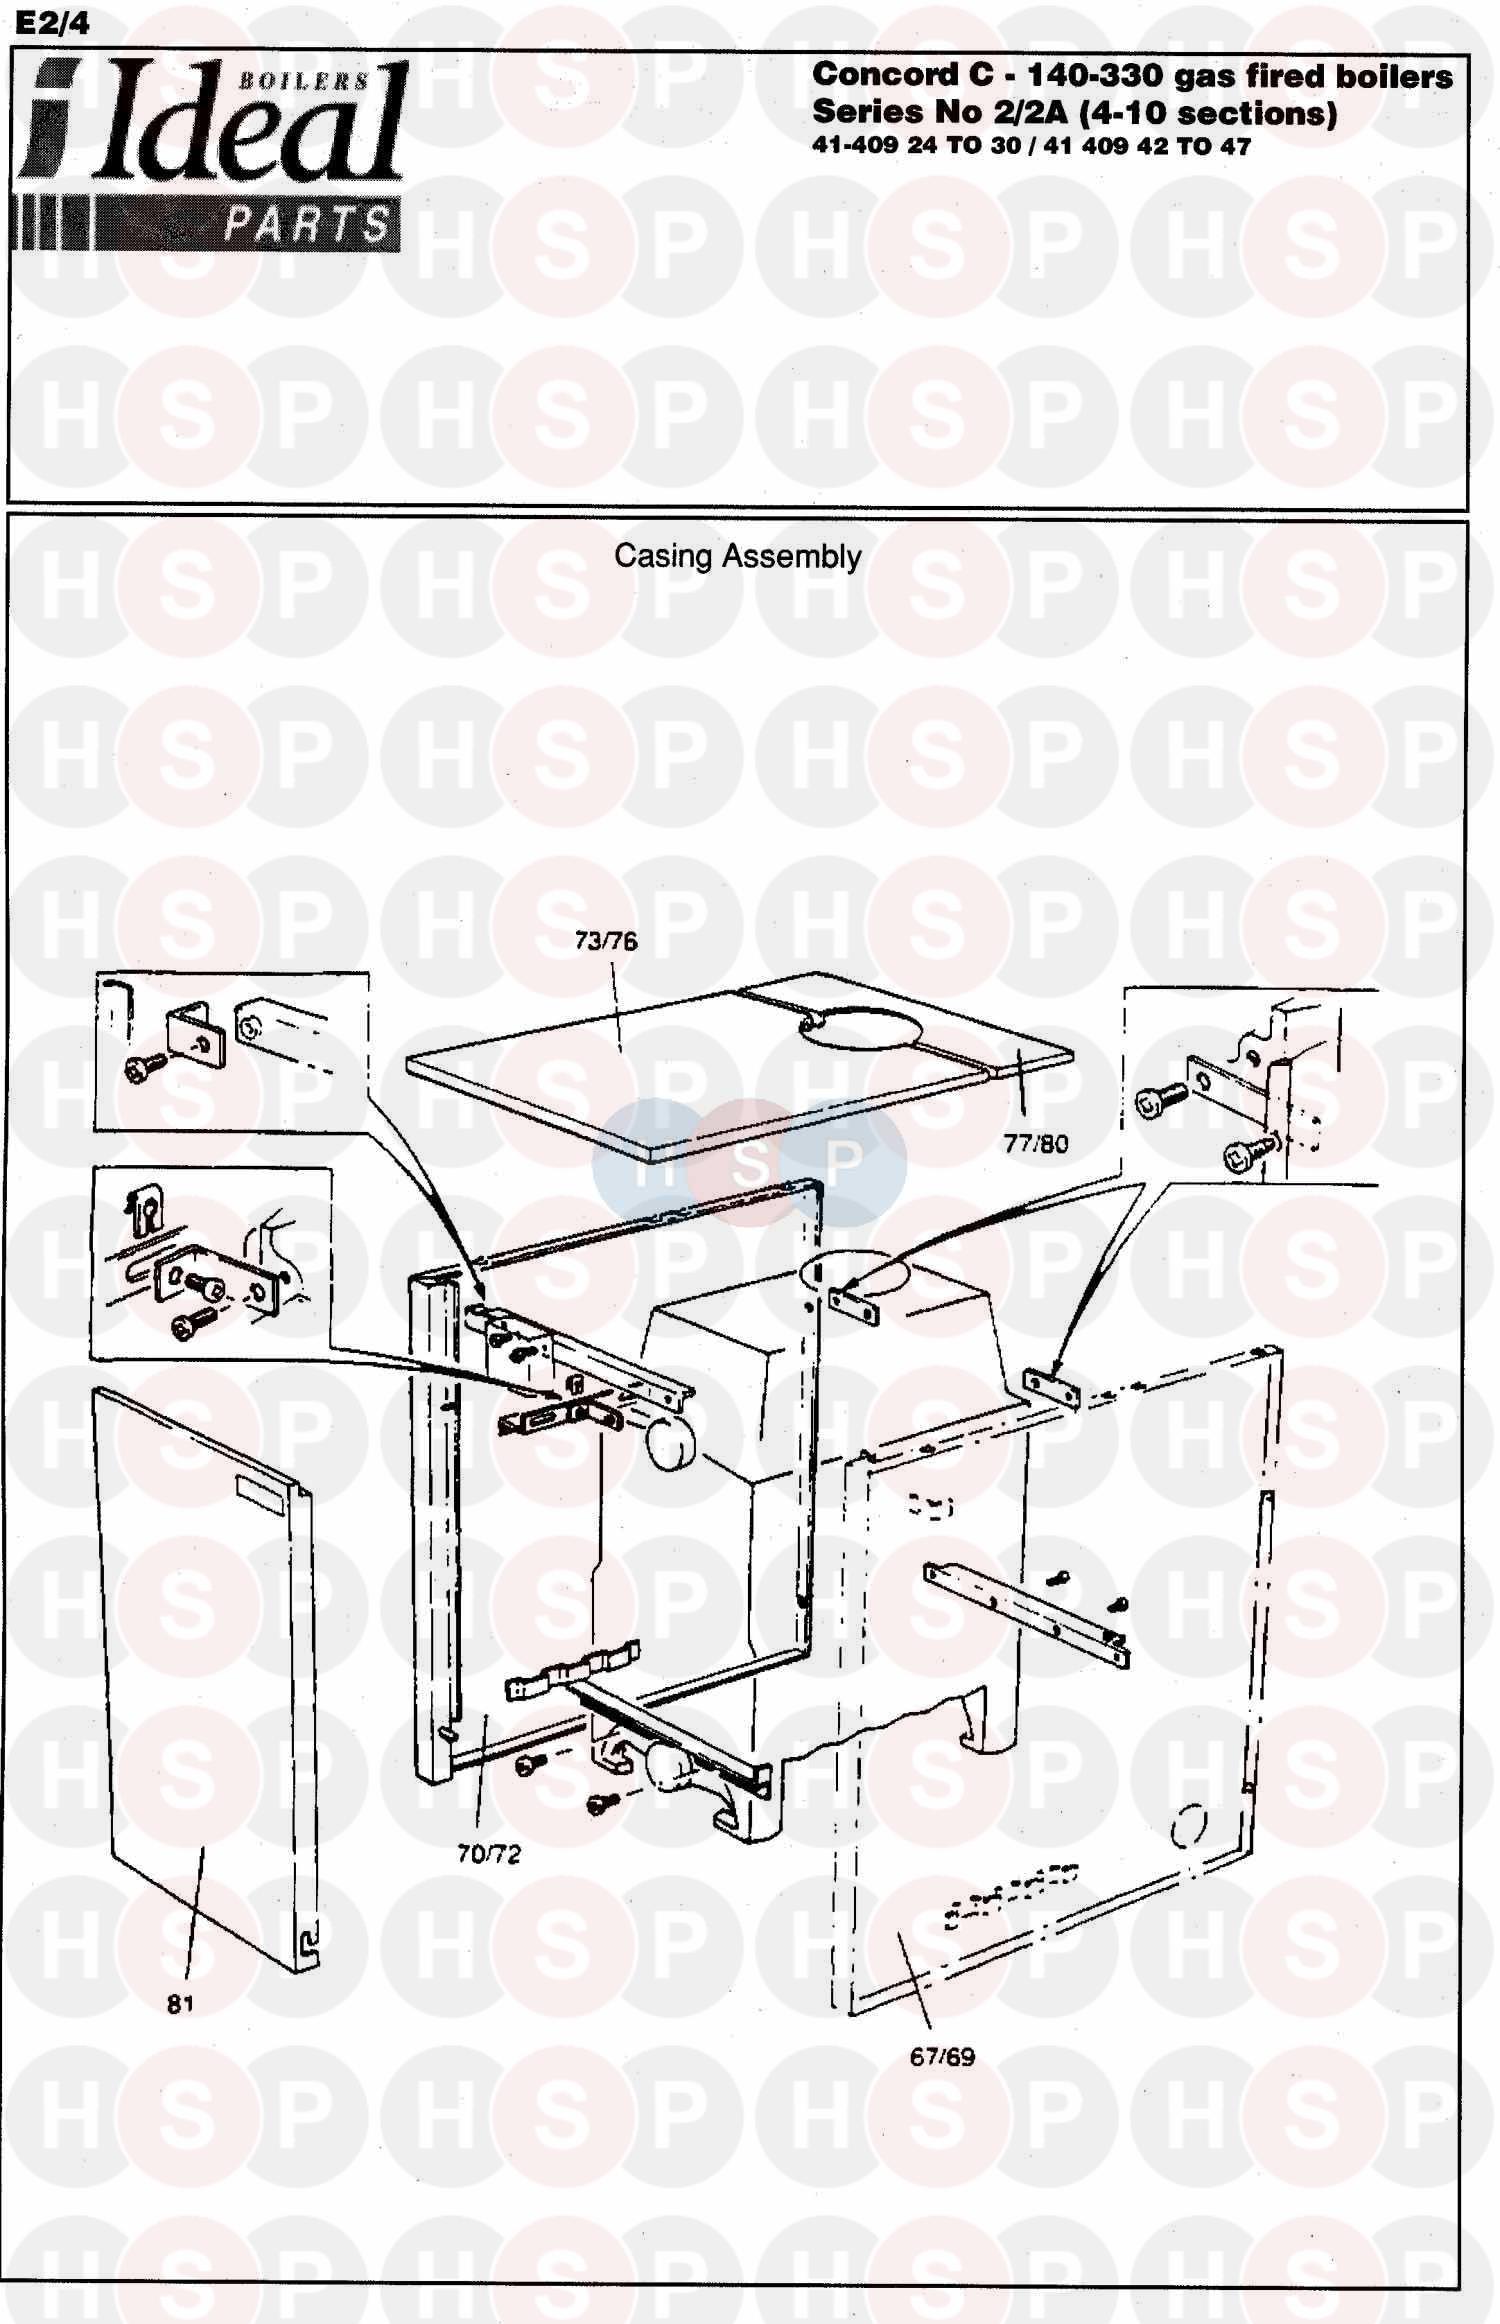 ideal concord c 2a 260 boiler casing diagram heating. Black Bedroom Furniture Sets. Home Design Ideas